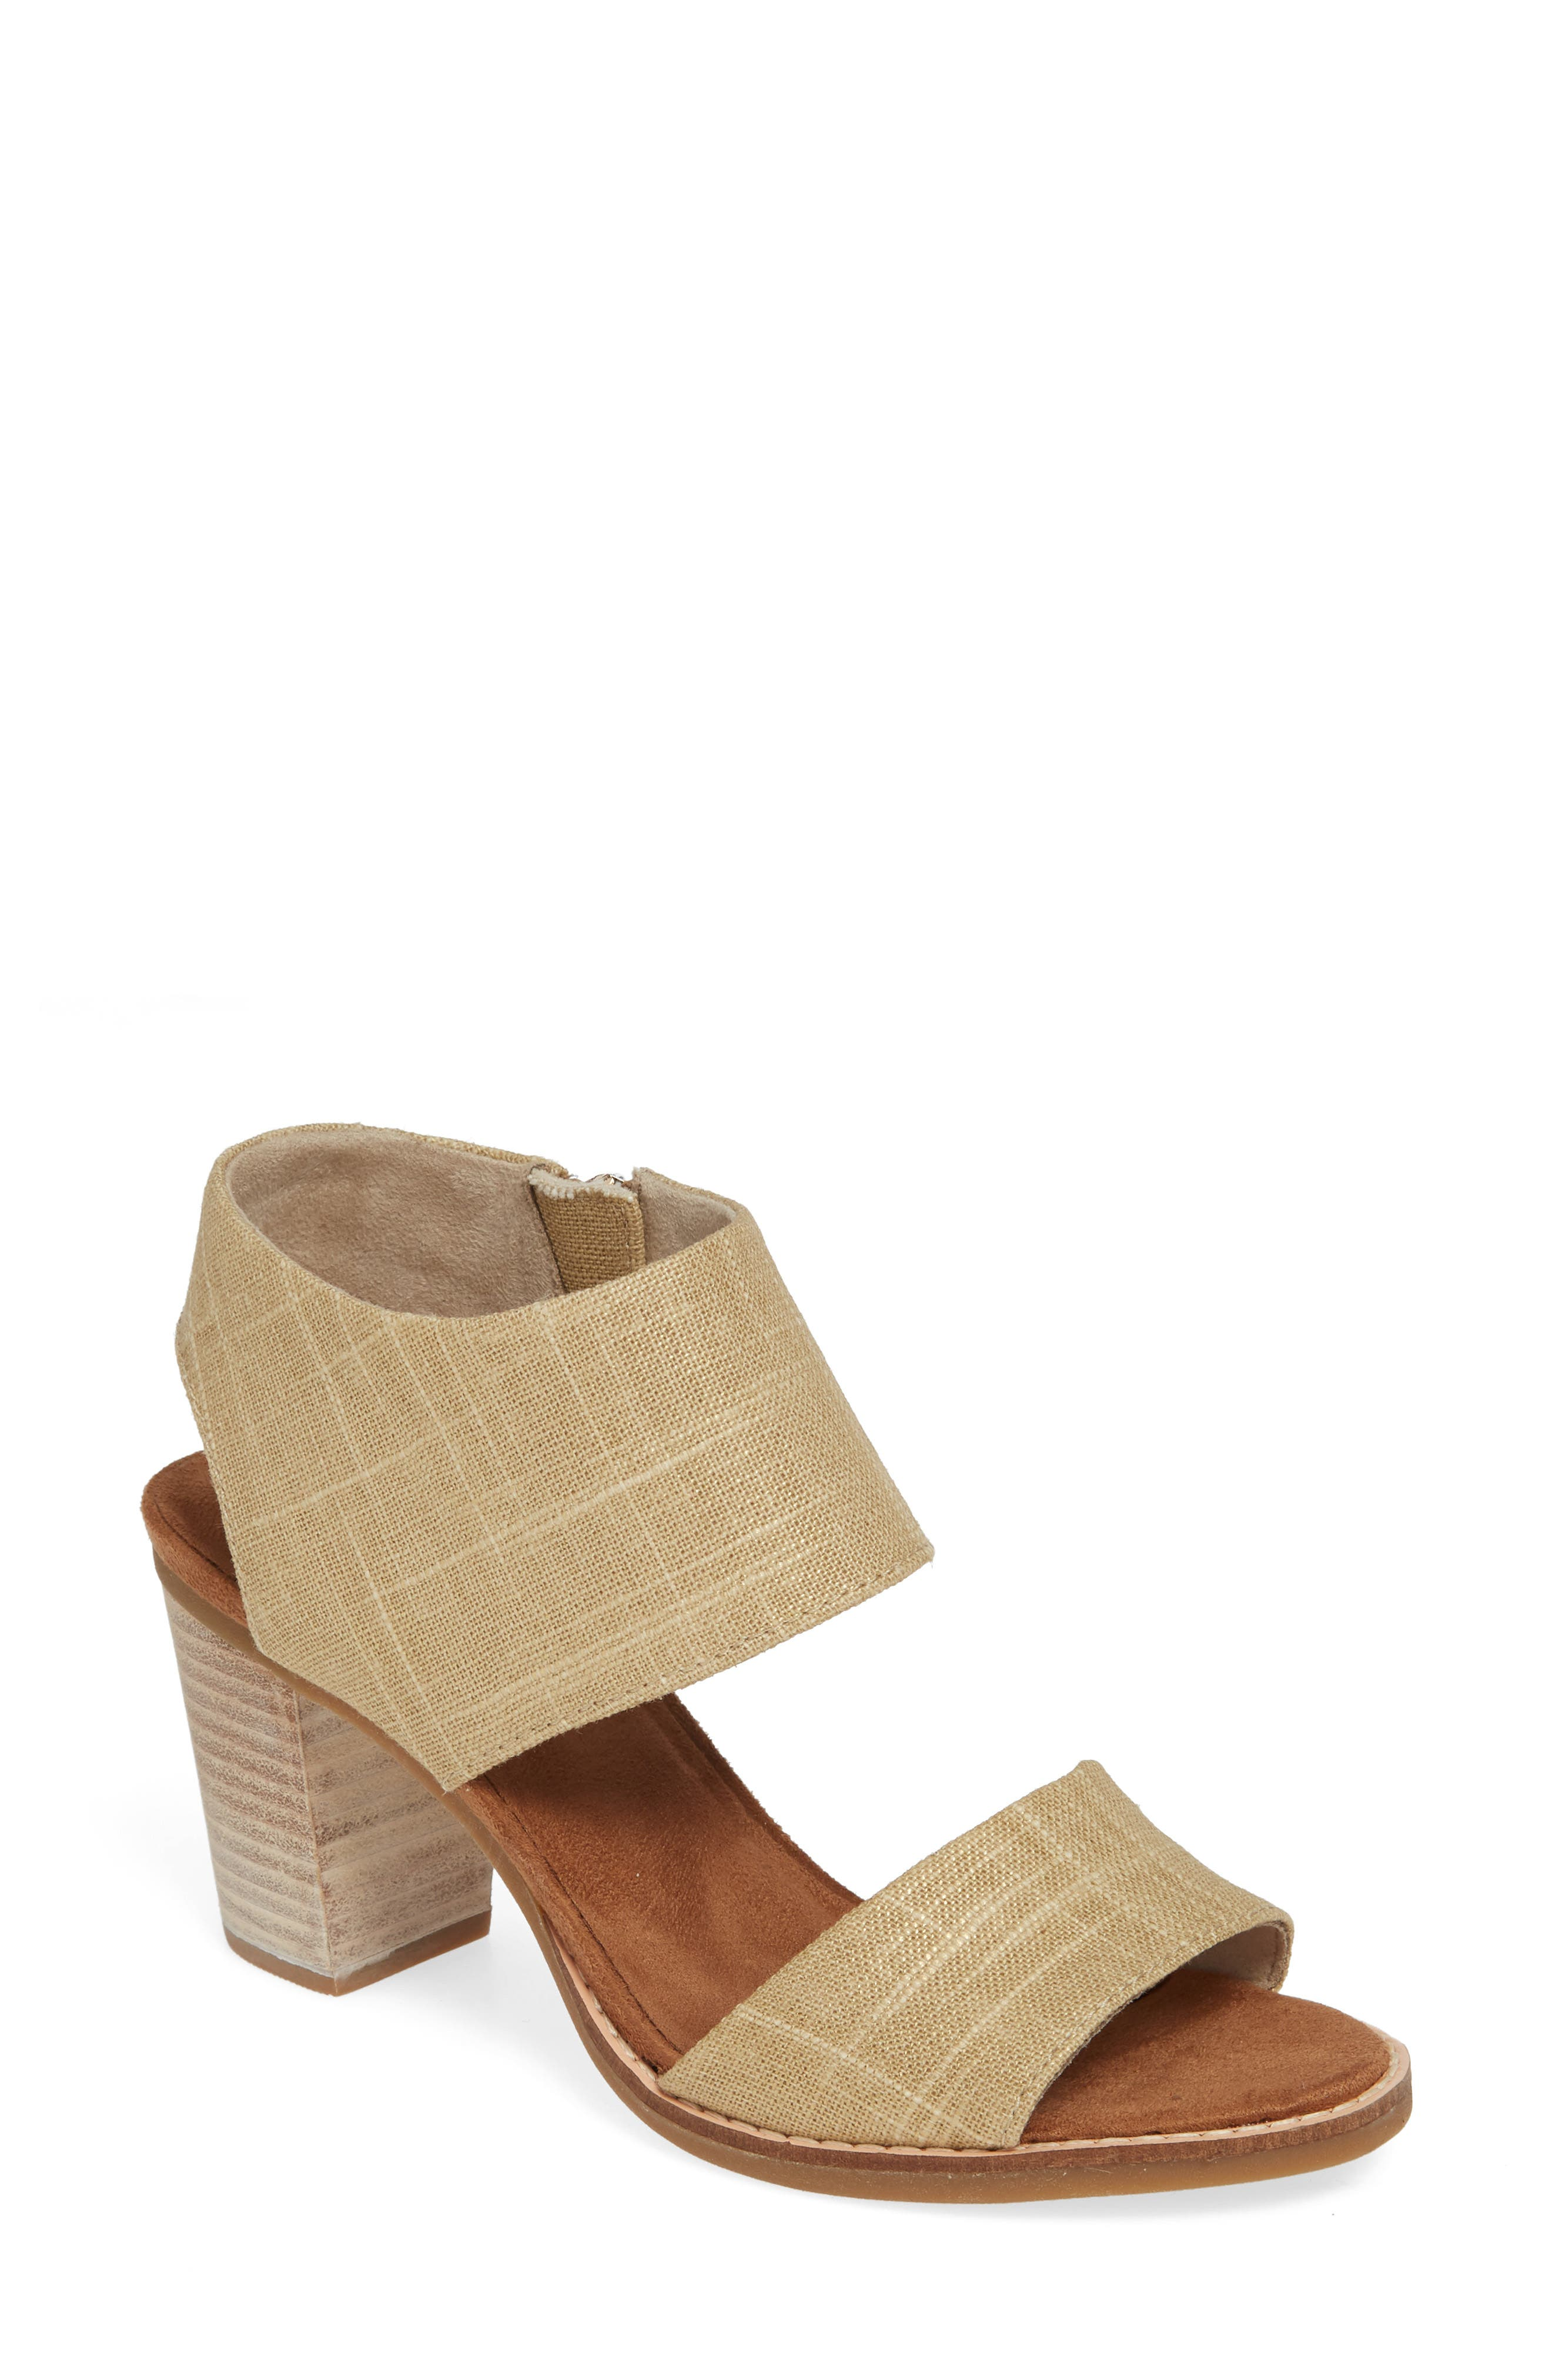 19395fbe4d2 TOMS Women s Sandals